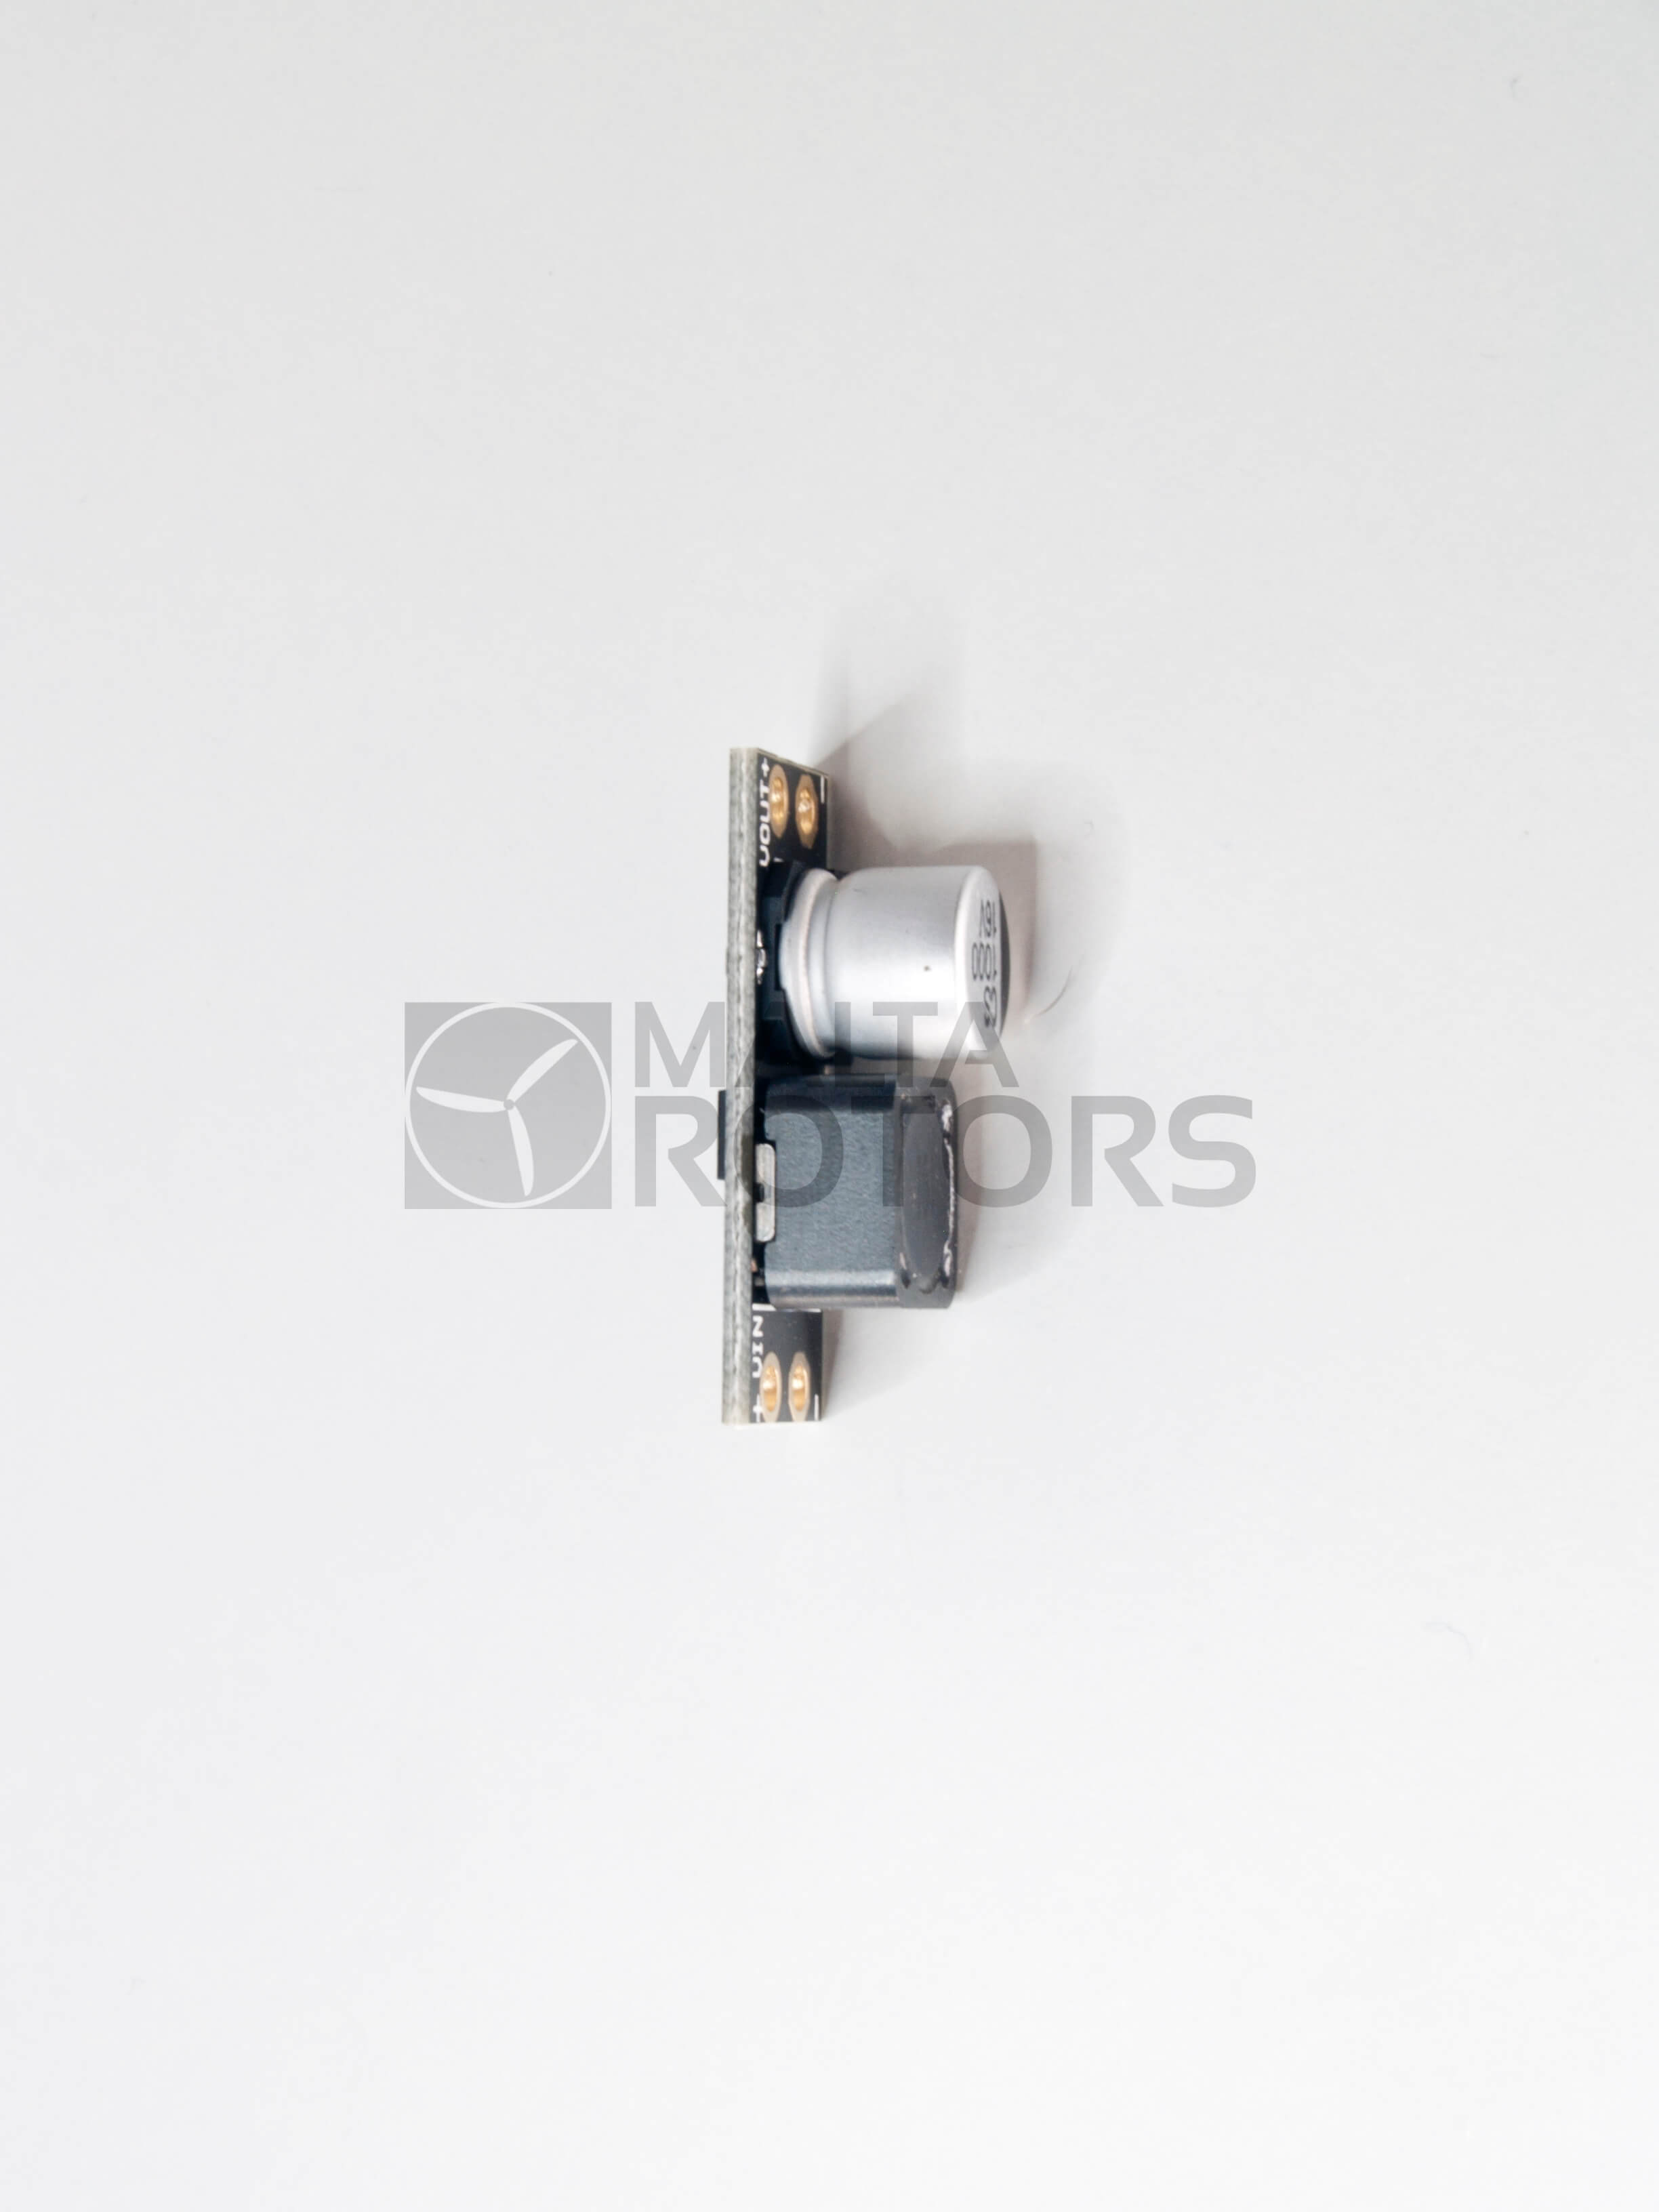 fpv lc filter 3a 8 4v 16 8v maltarotors. Black Bedroom Furniture Sets. Home Design Ideas